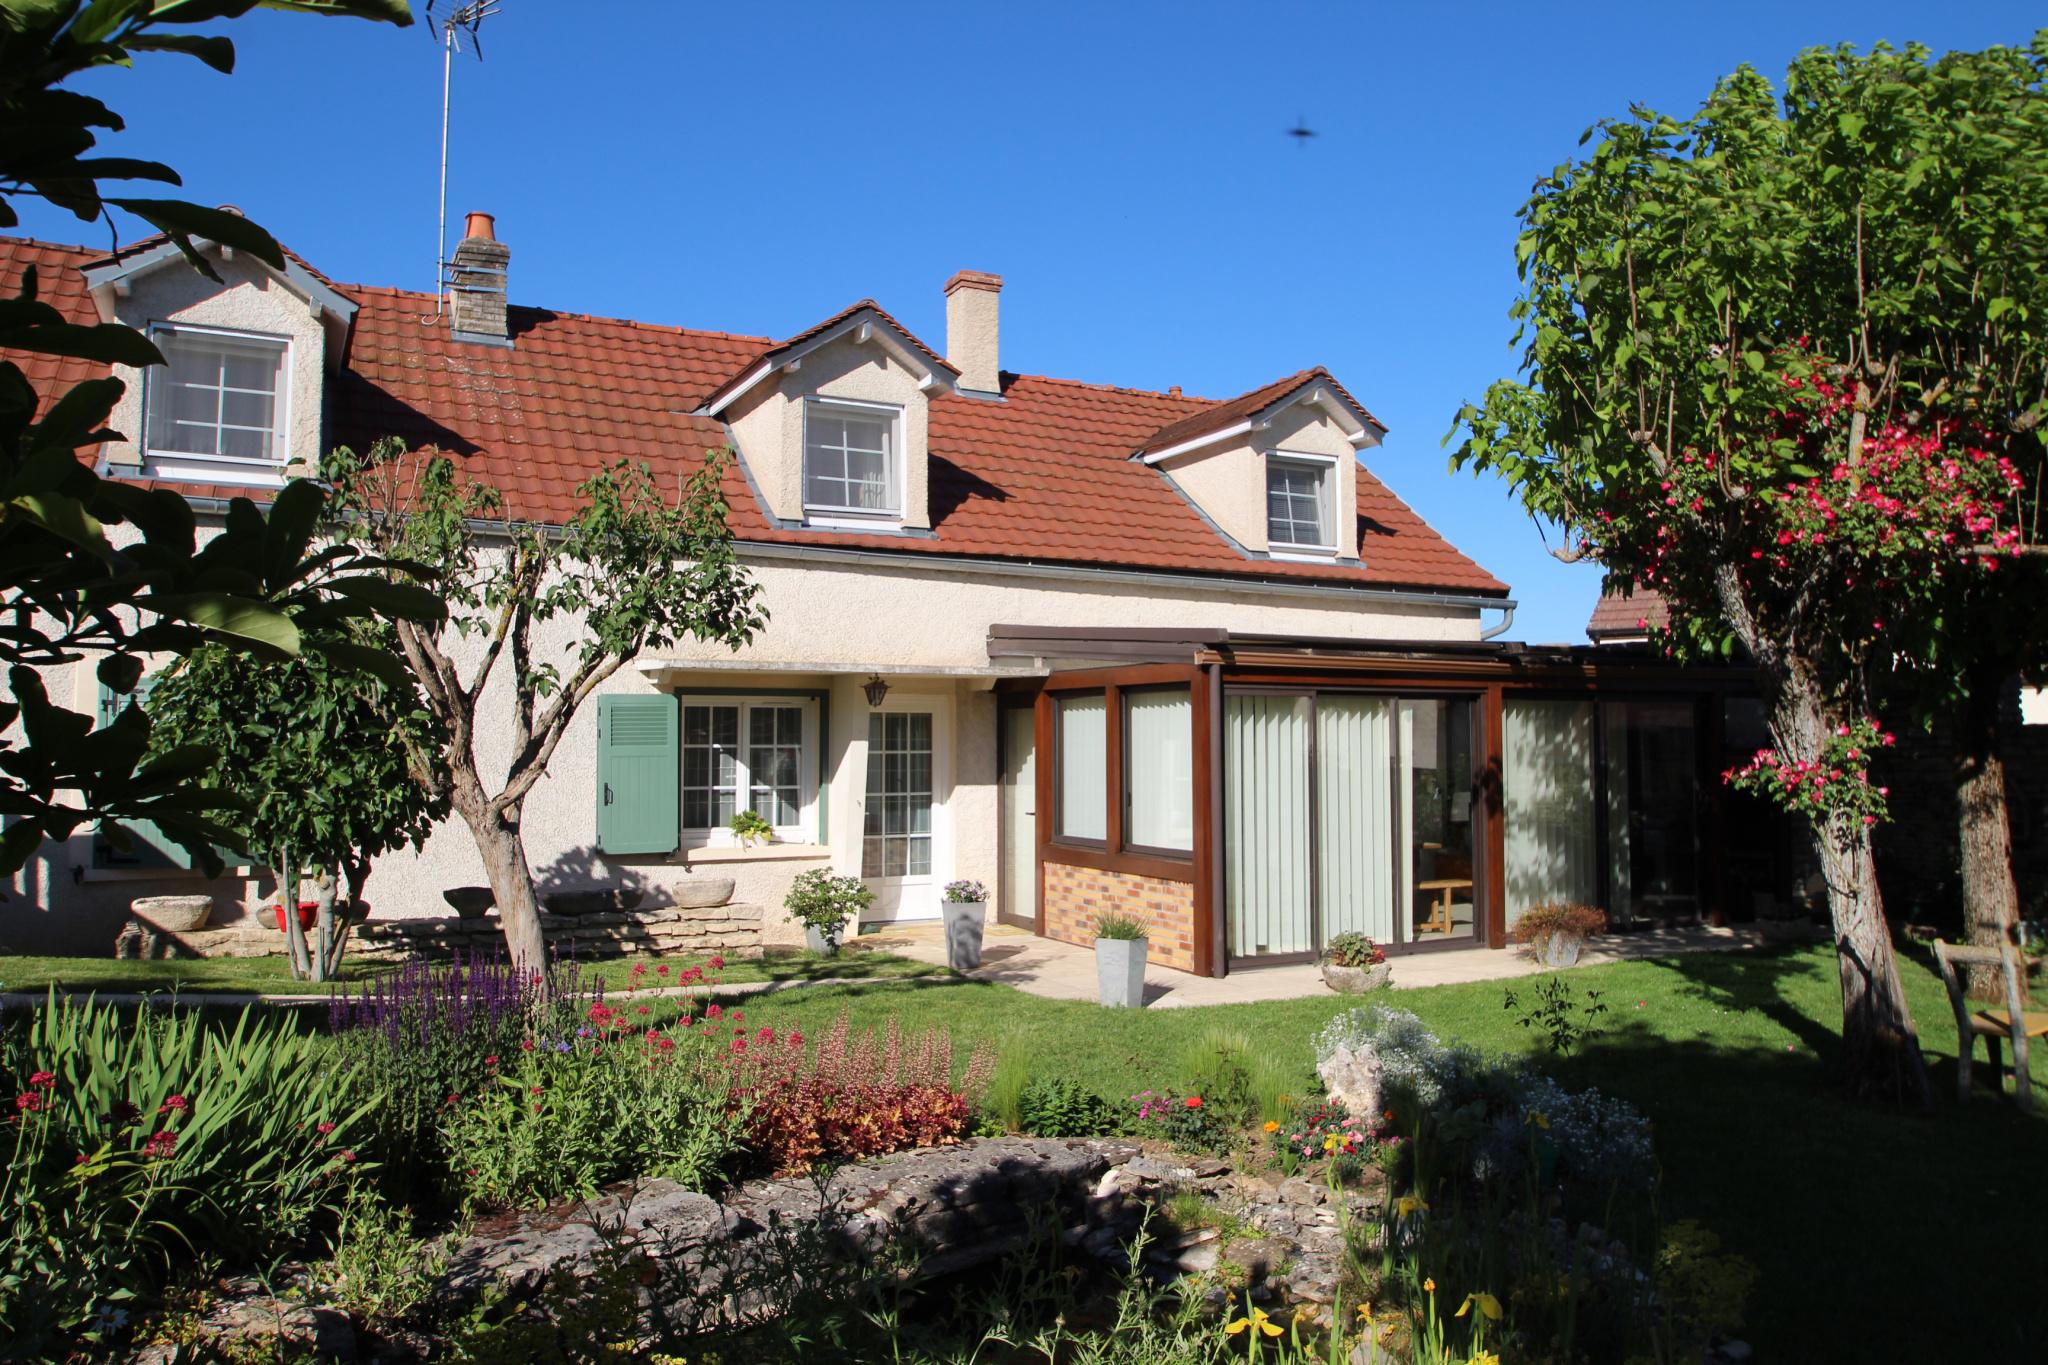 Vente maison/villa epagny TRANSCO